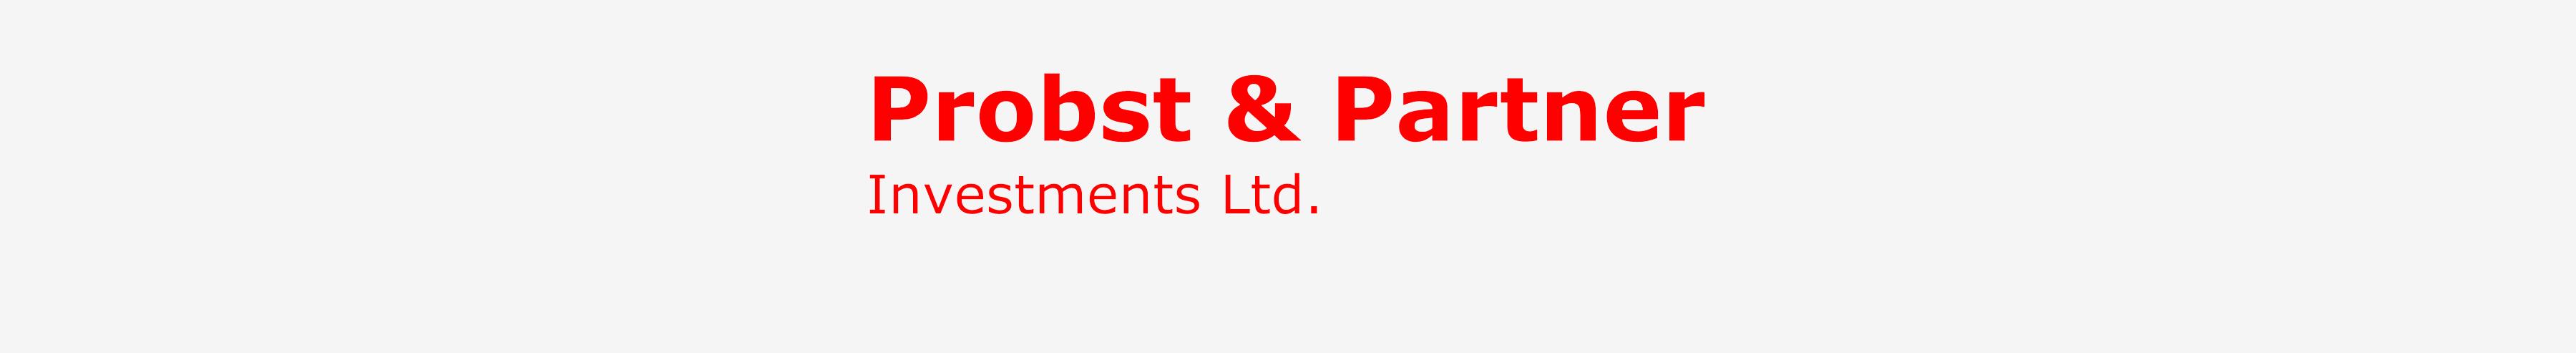 Probst & Partner, Investments Ltd.